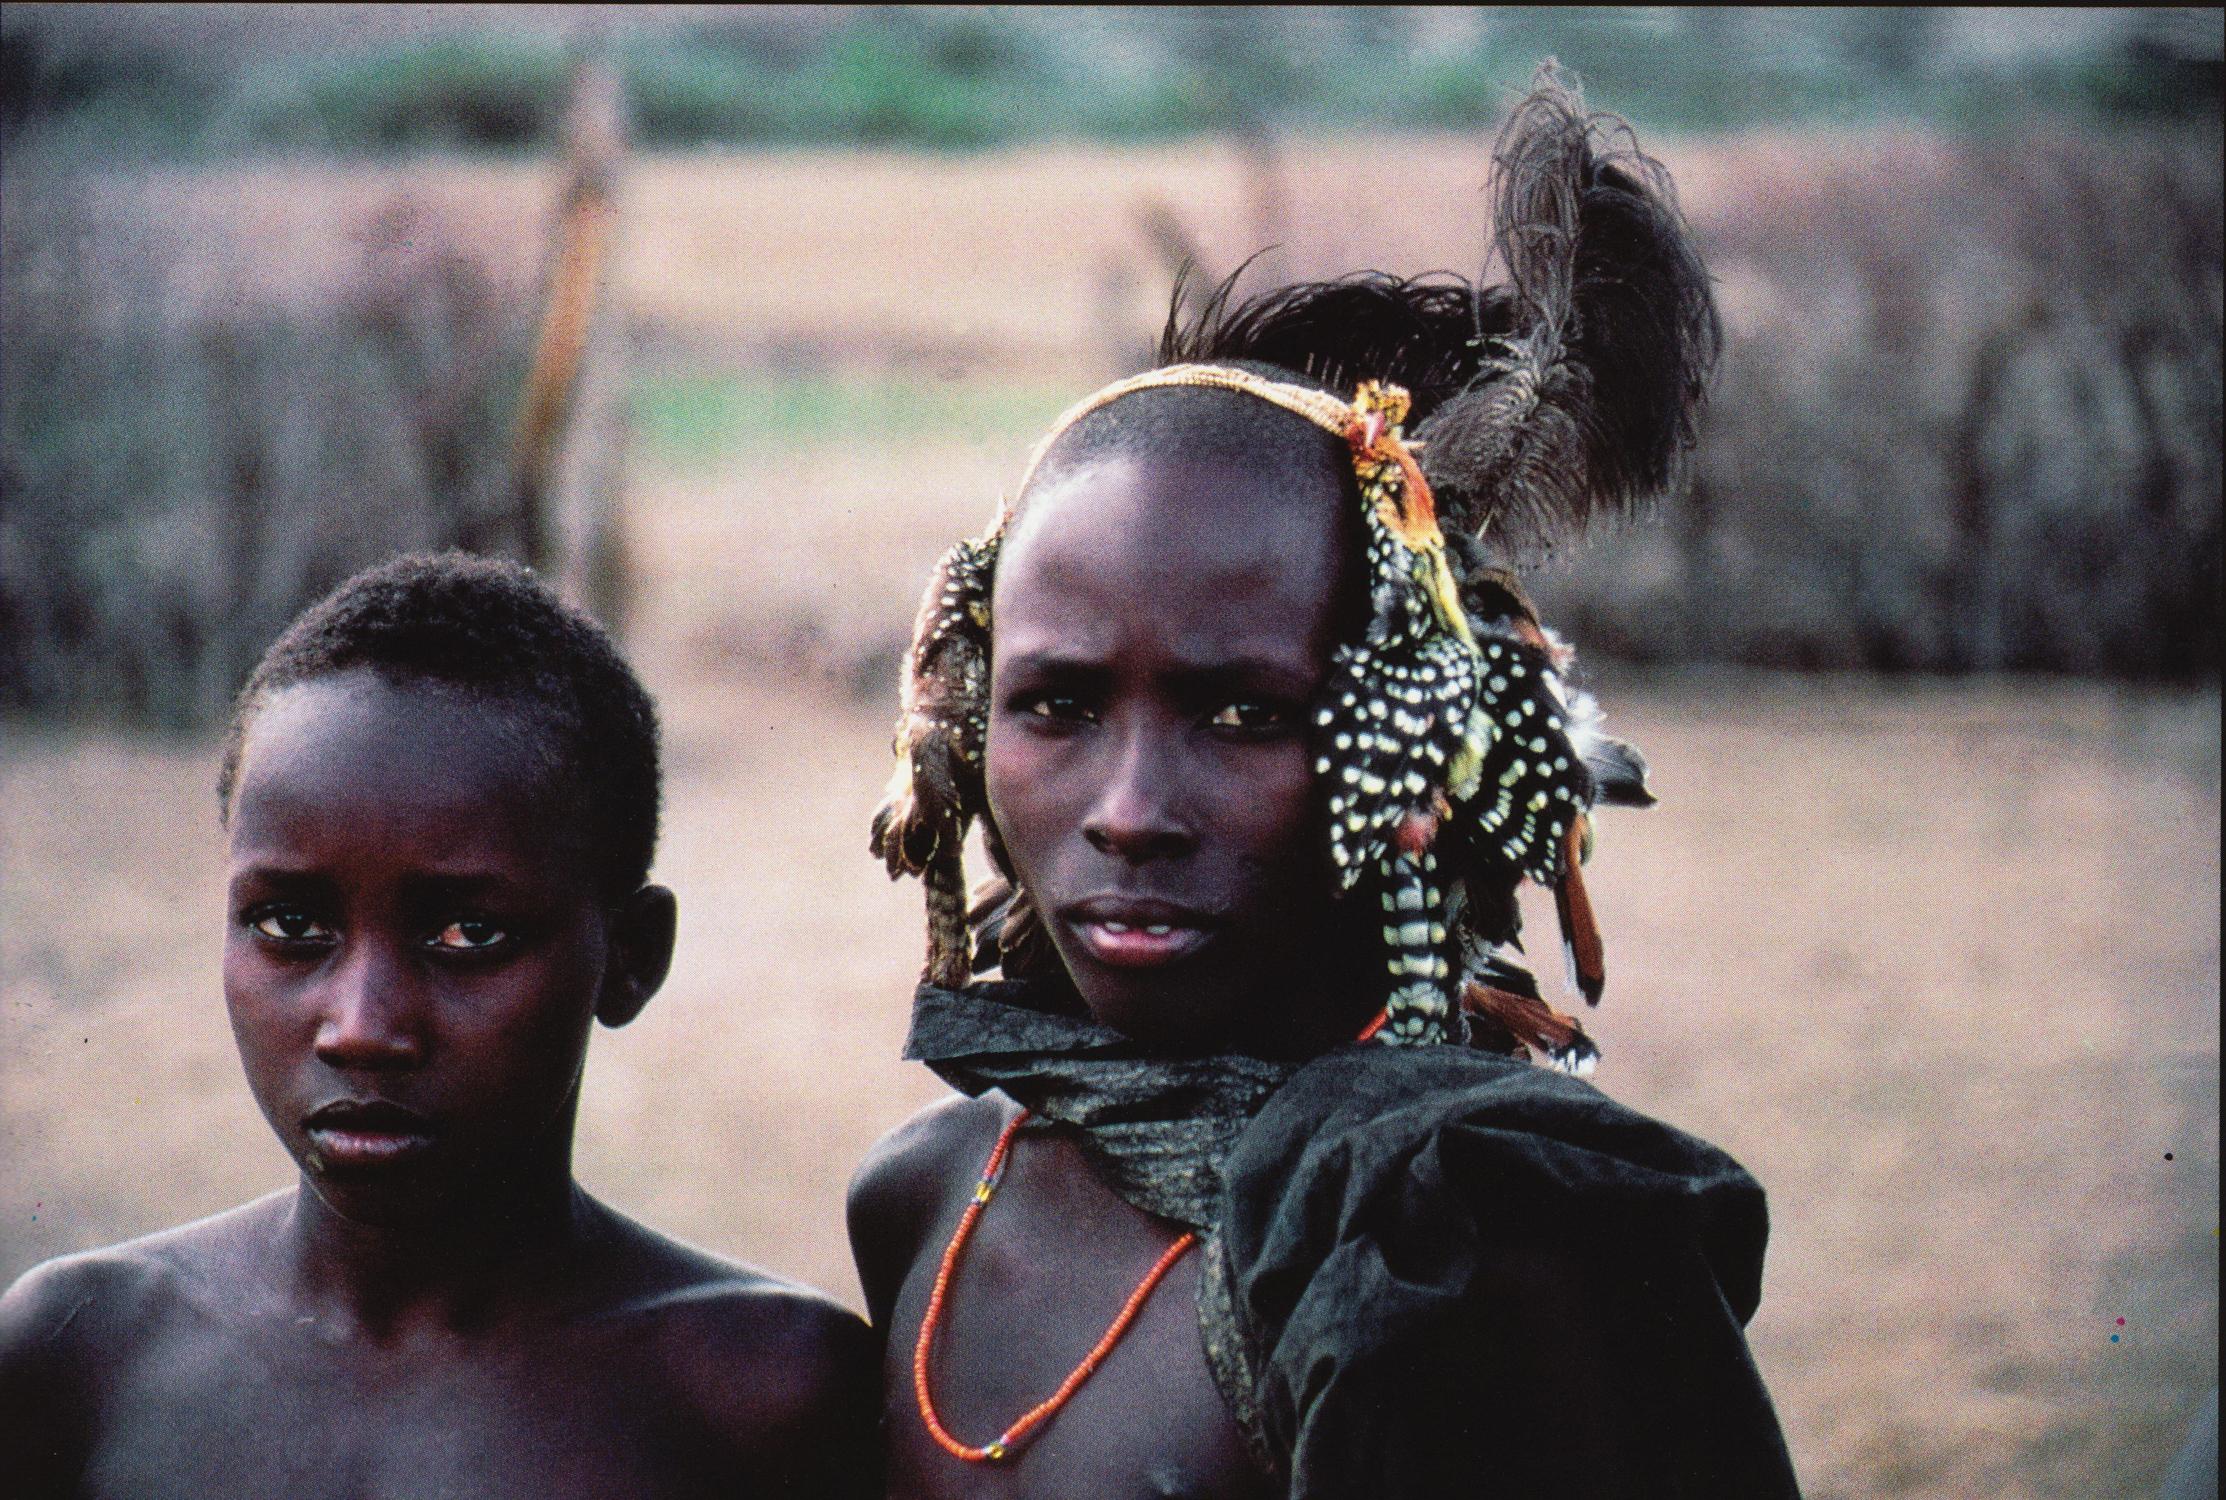 04, Rift Valley, Kenya